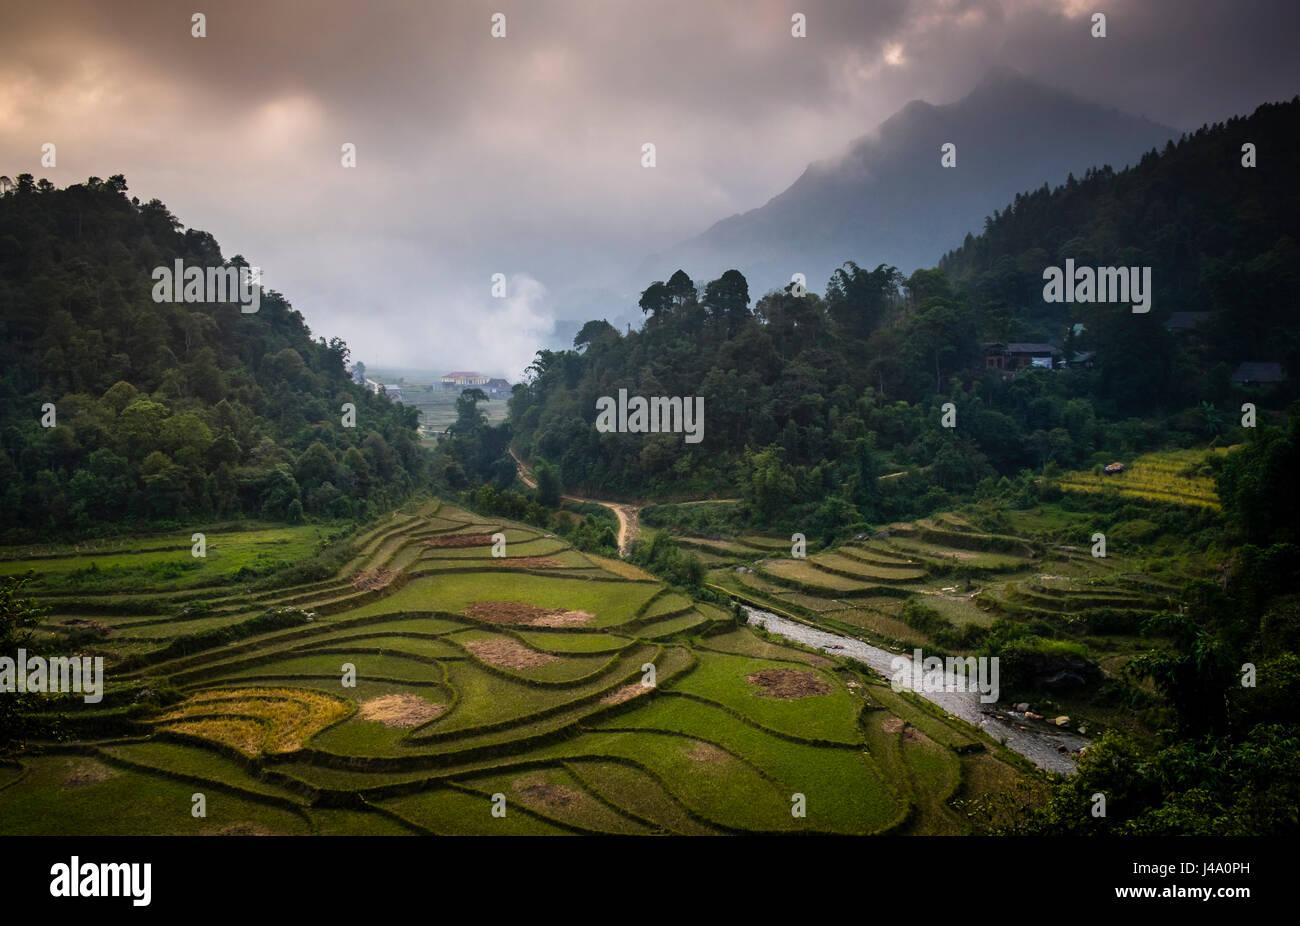 SAPA, VIETNAM - CIRCA SEPTEMBER 2014:  View of typical rice  paddy landscape in Sapa, north Vietnam. - Stock Image